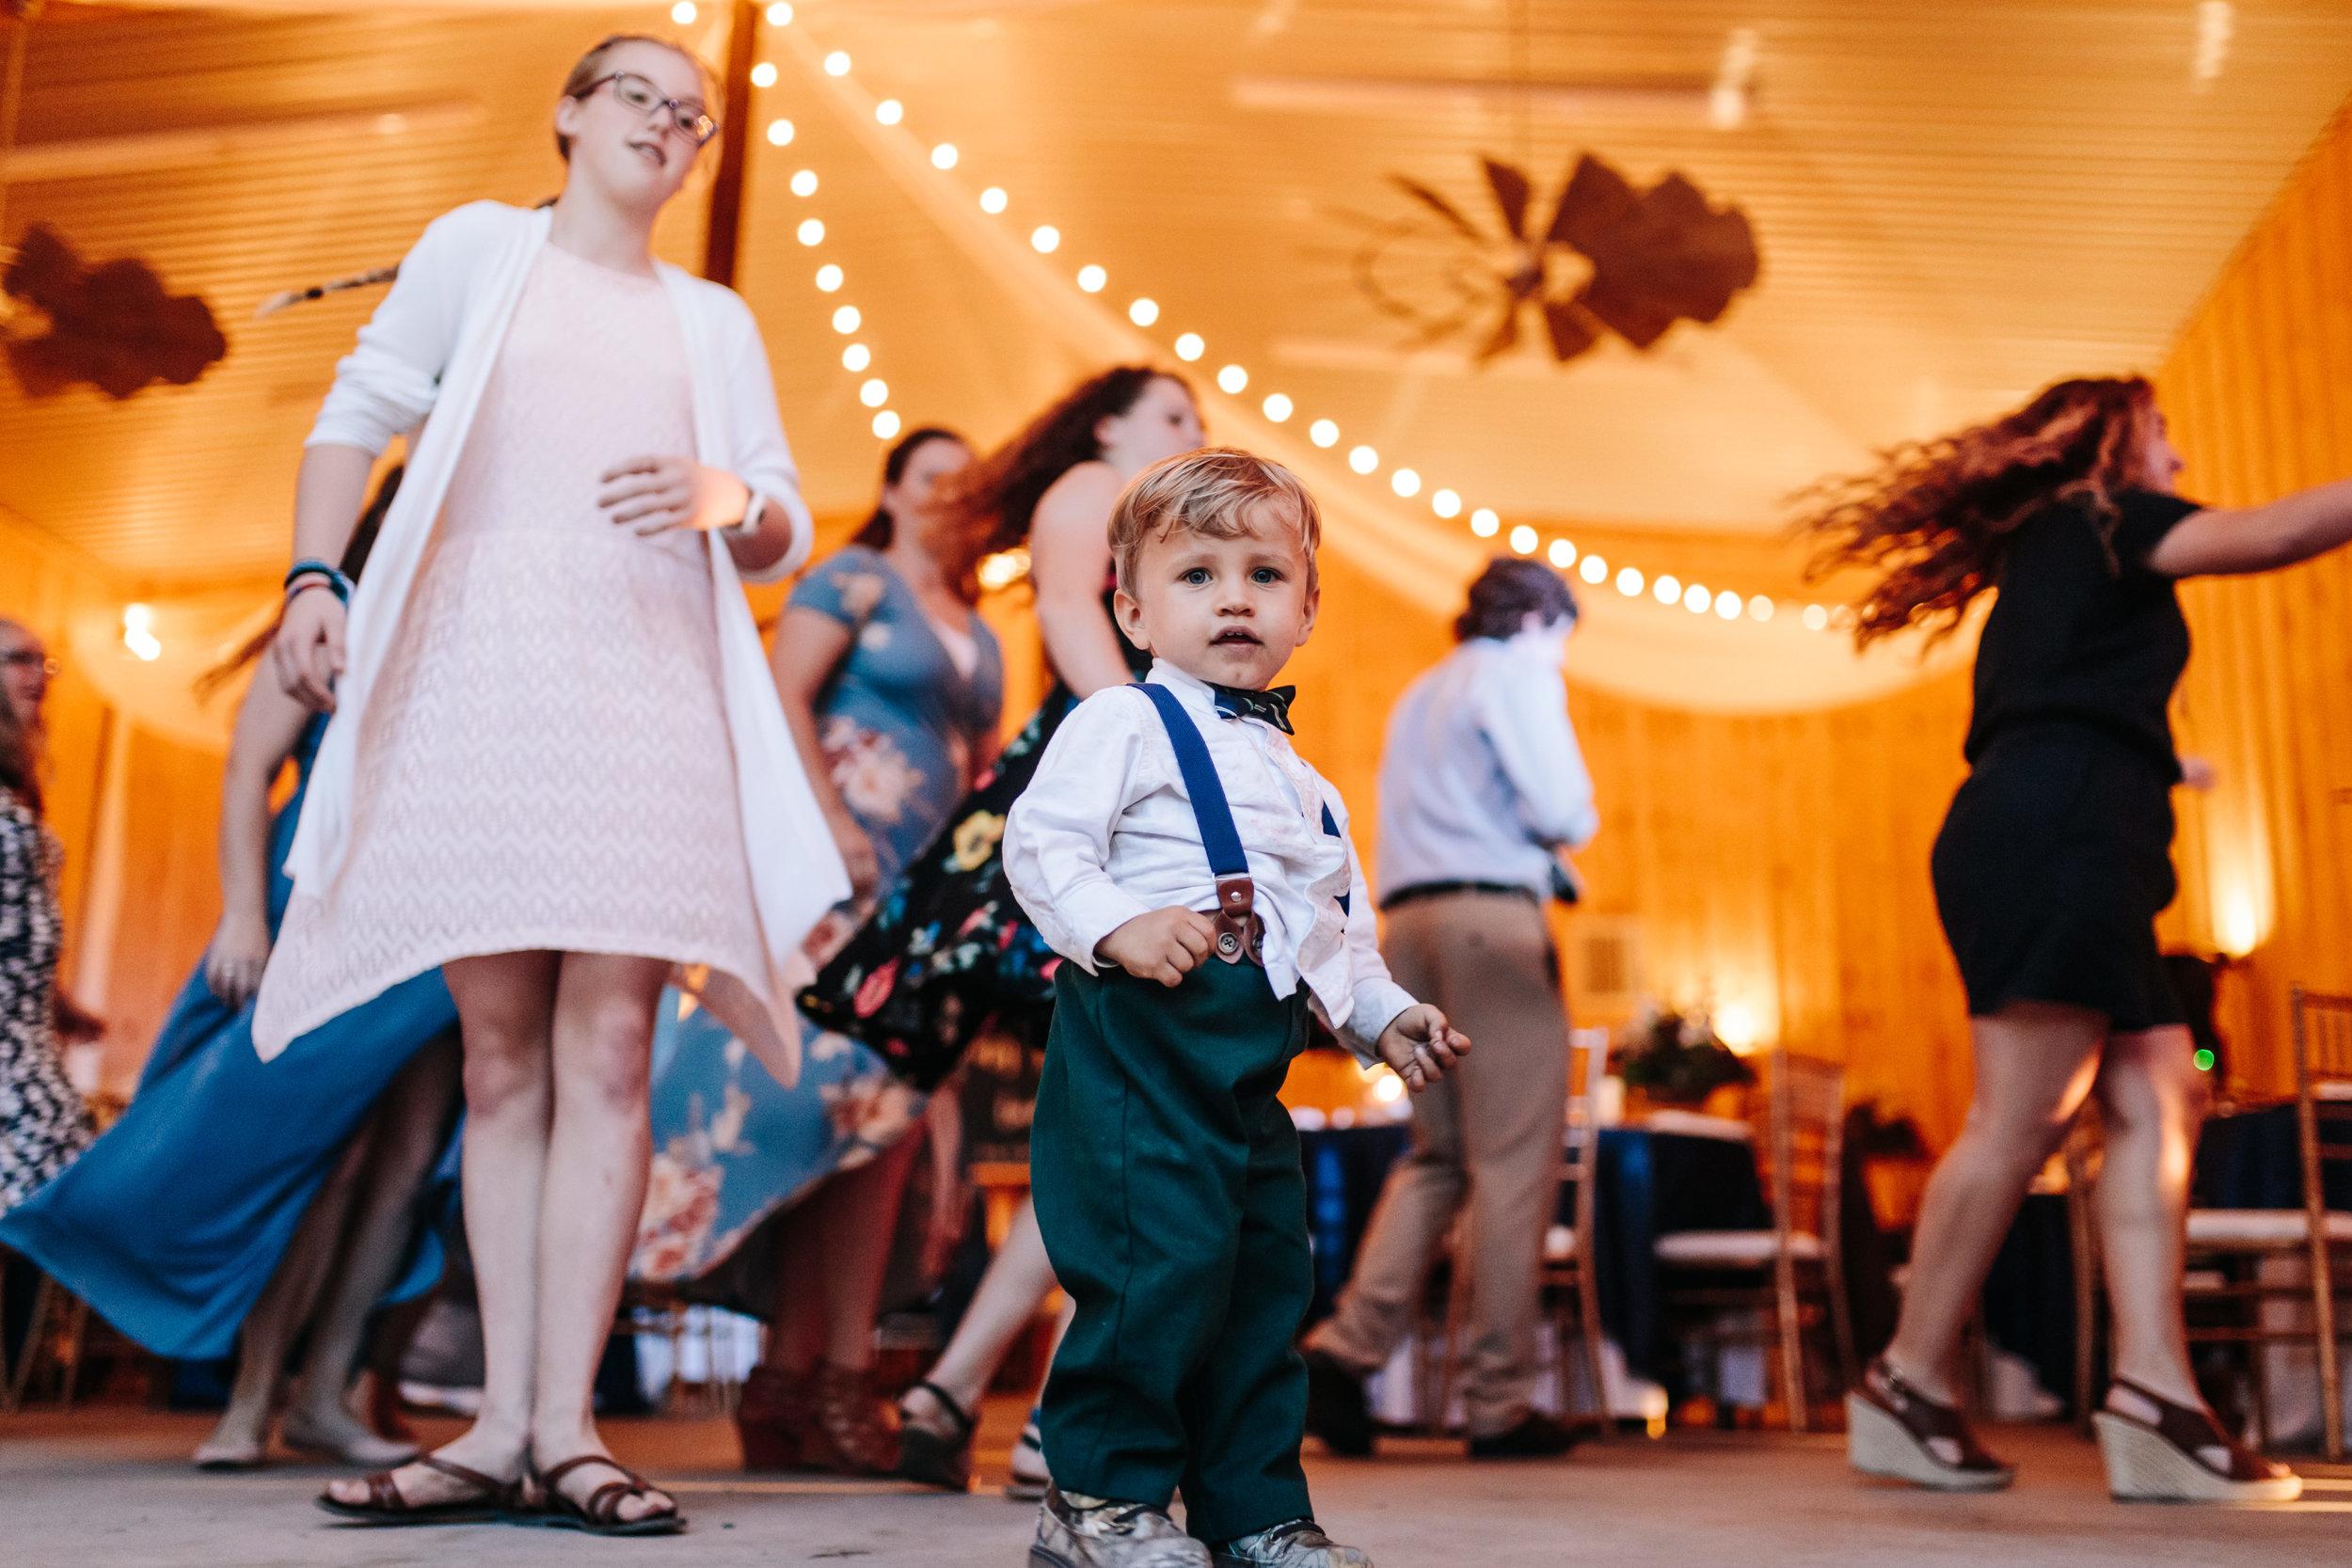 2018.04.14 Zak and Jamisyn Unrue Black Willow Barn Wedding Finals-831.jpg